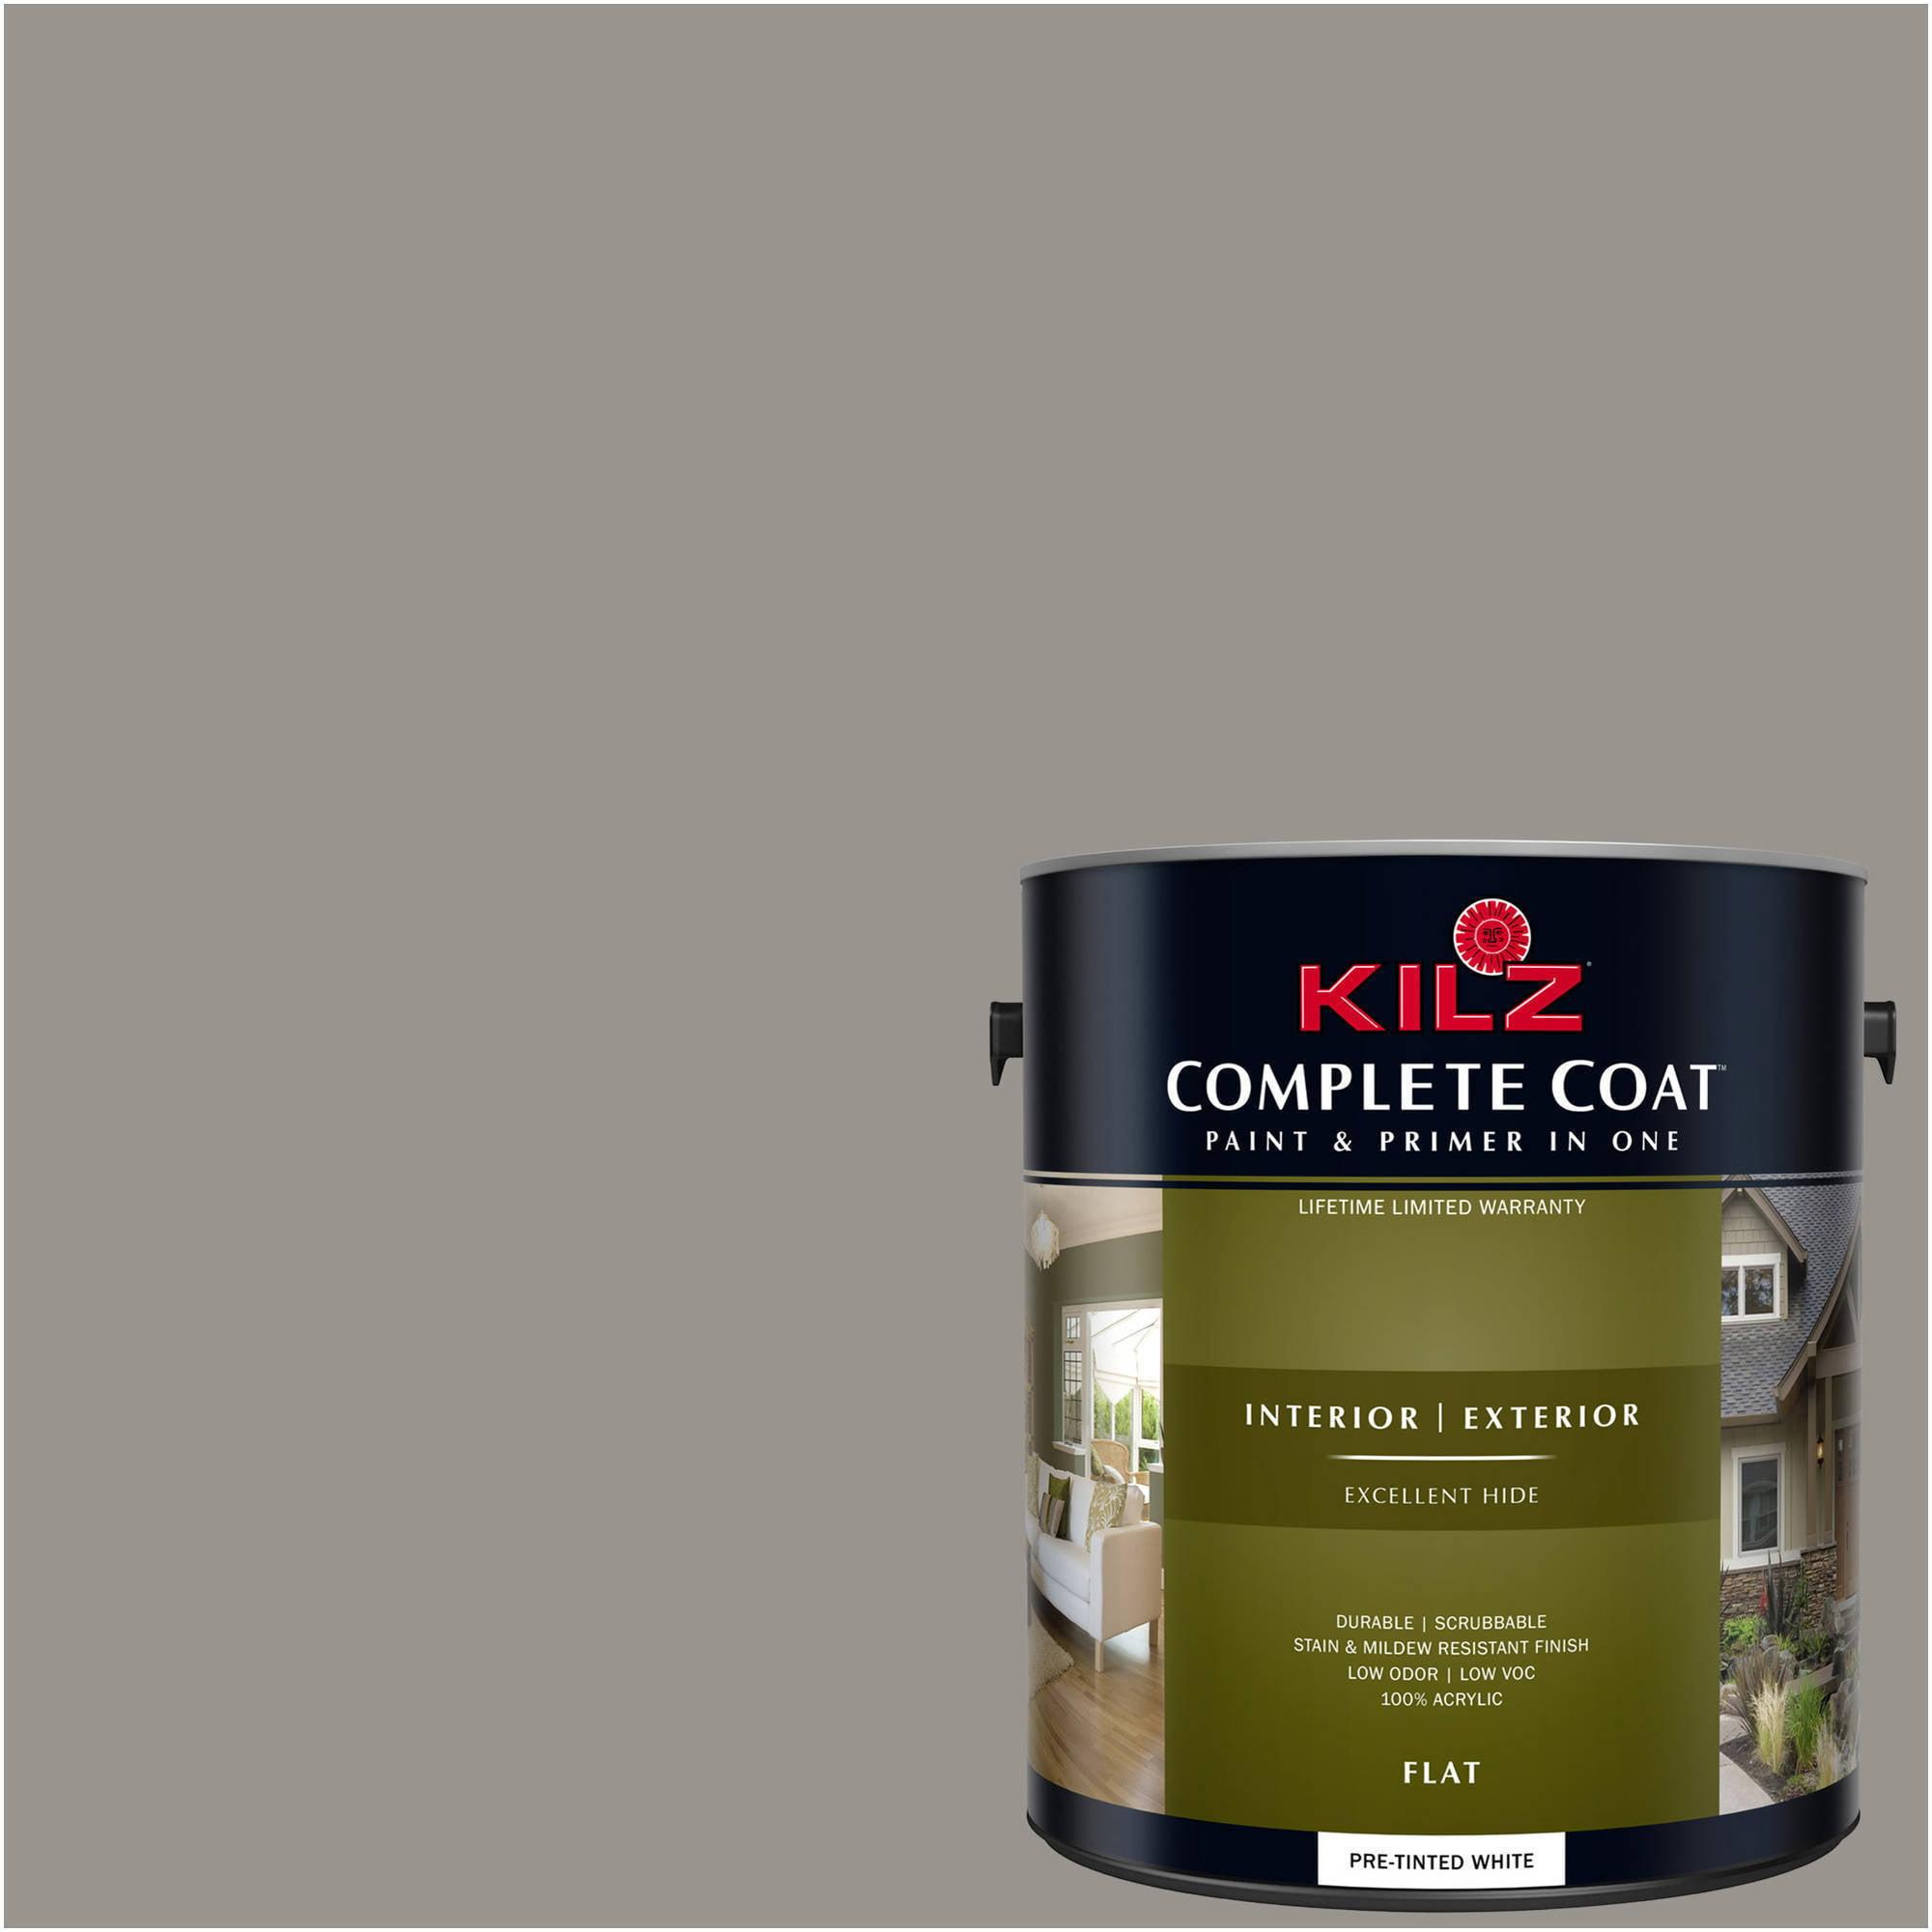 KILZ COMPLETE COAT Interior/Exterior Paint & Primer in One #RL160 Lost Space